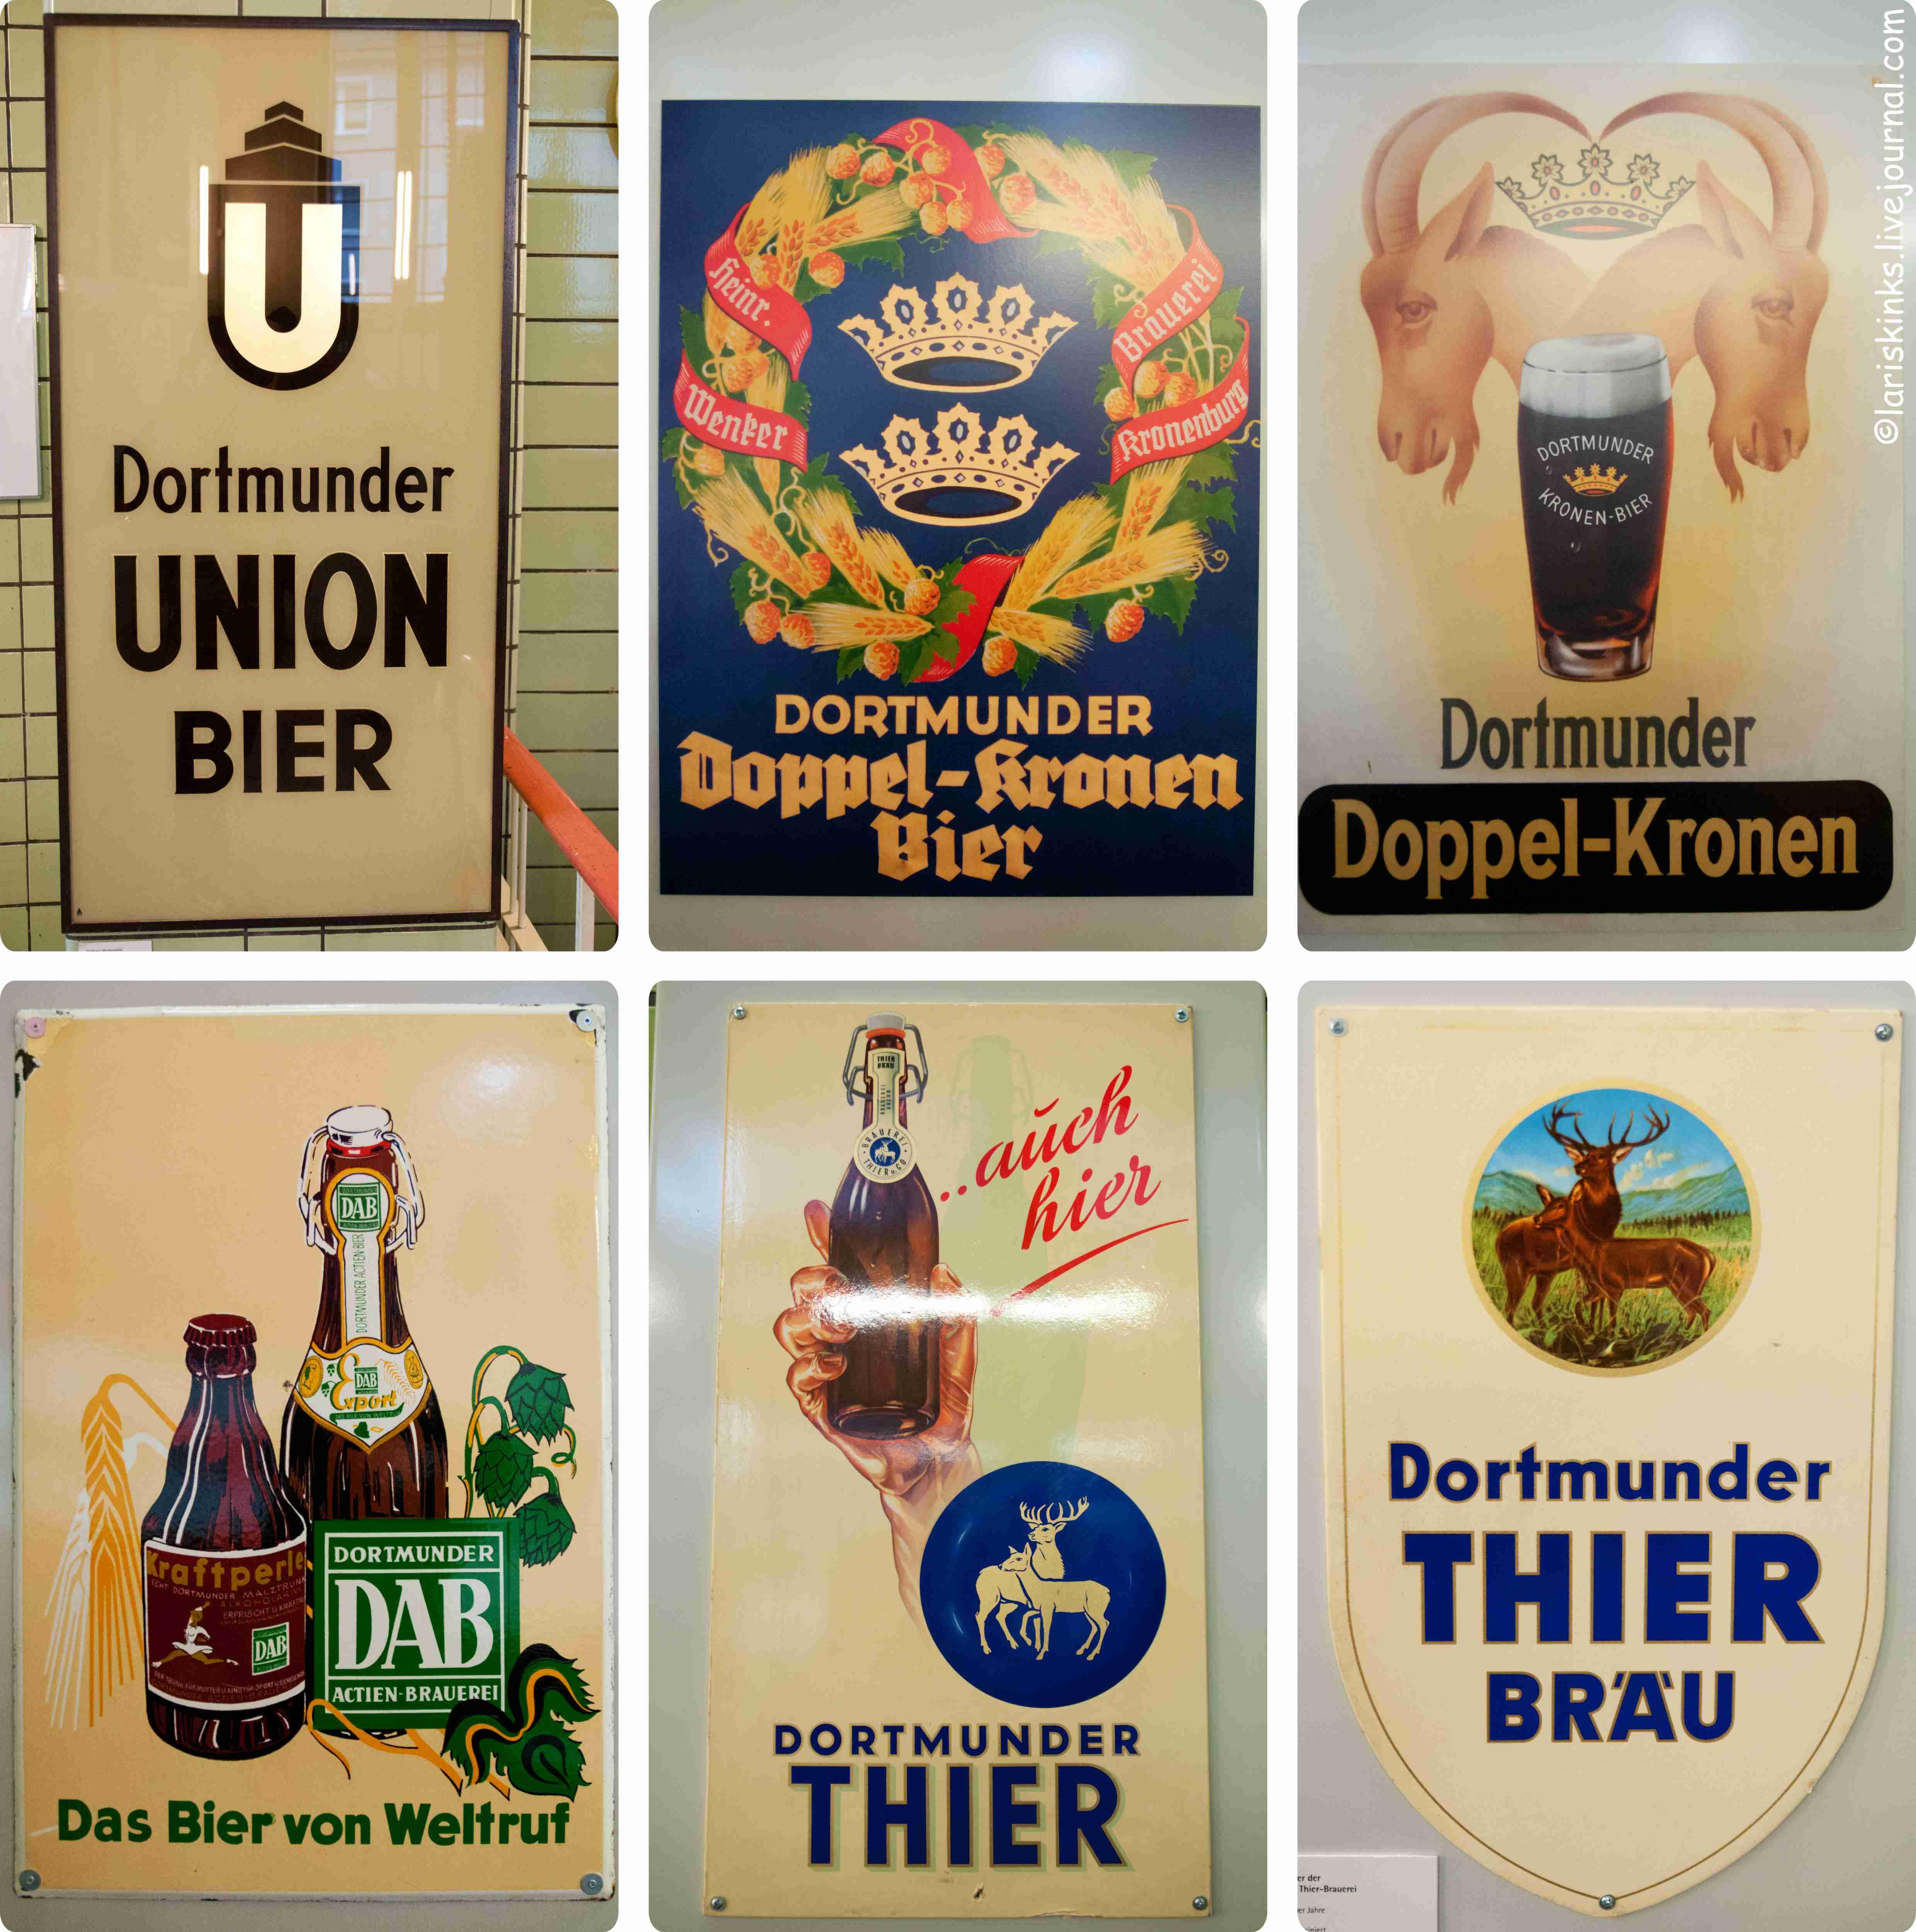 Таблички в Музее Пива (Дортмунд, Германия) 05